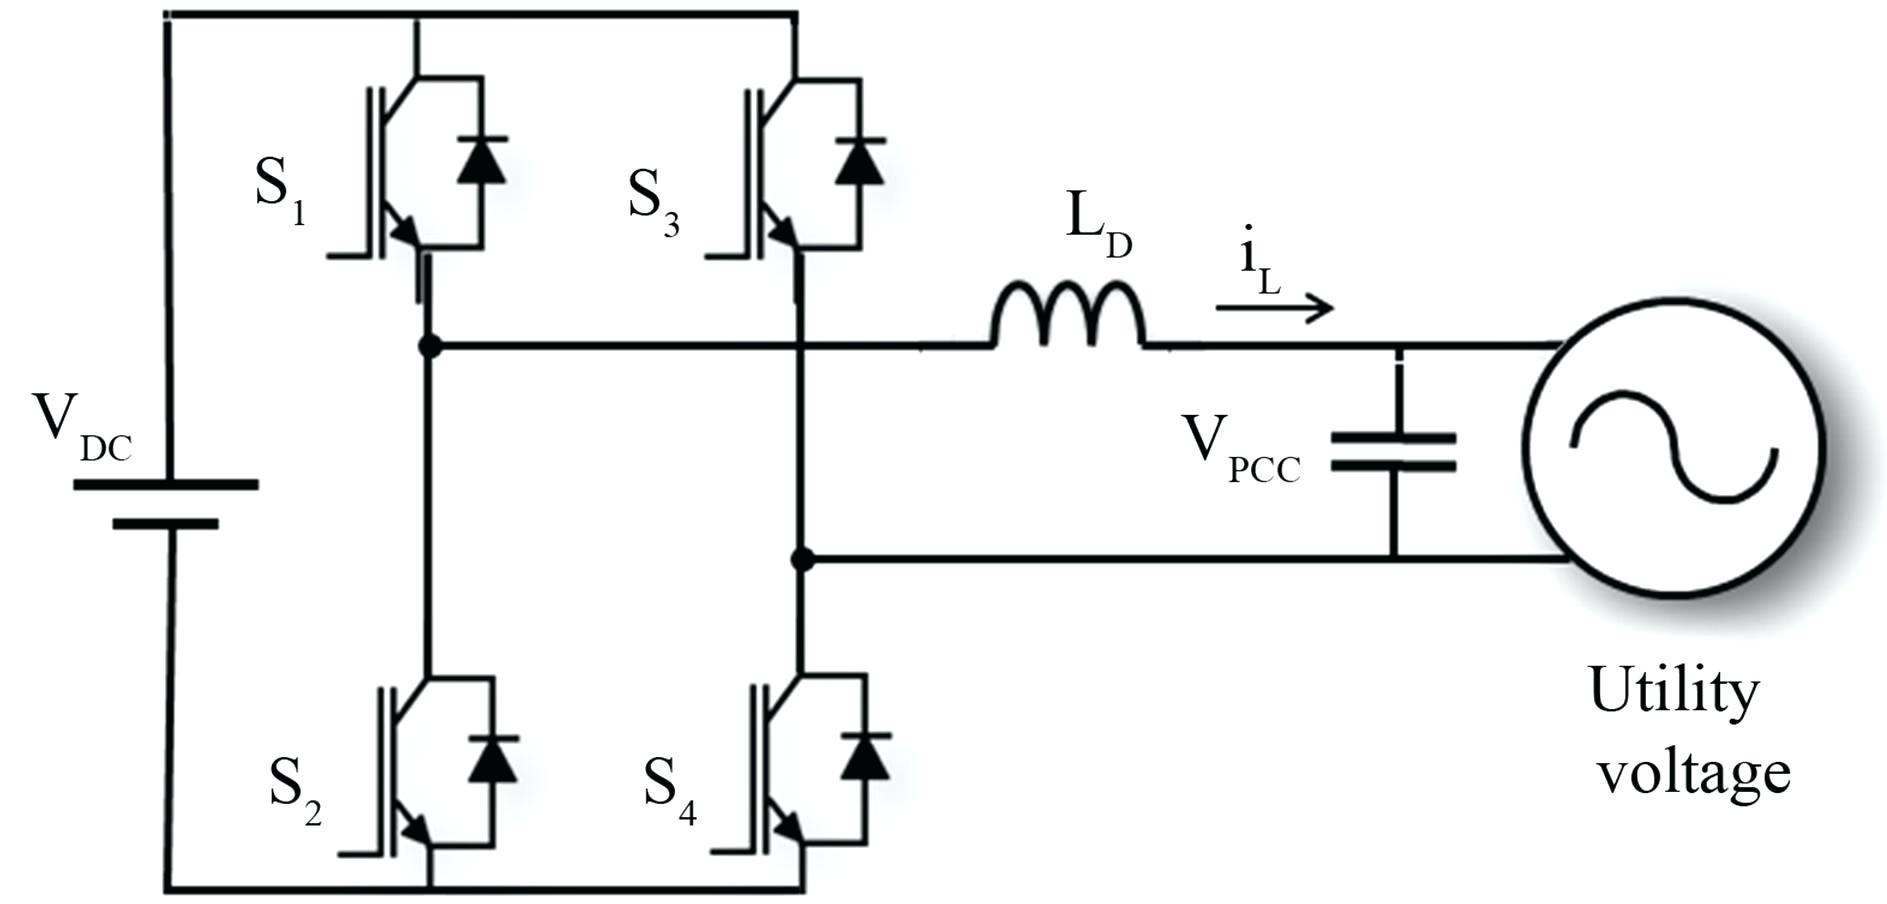 Patlite Signal Tower Wiring Diagram Full Size Of Ididit Steering - Gm Starter Solenoid Wiring Diagram